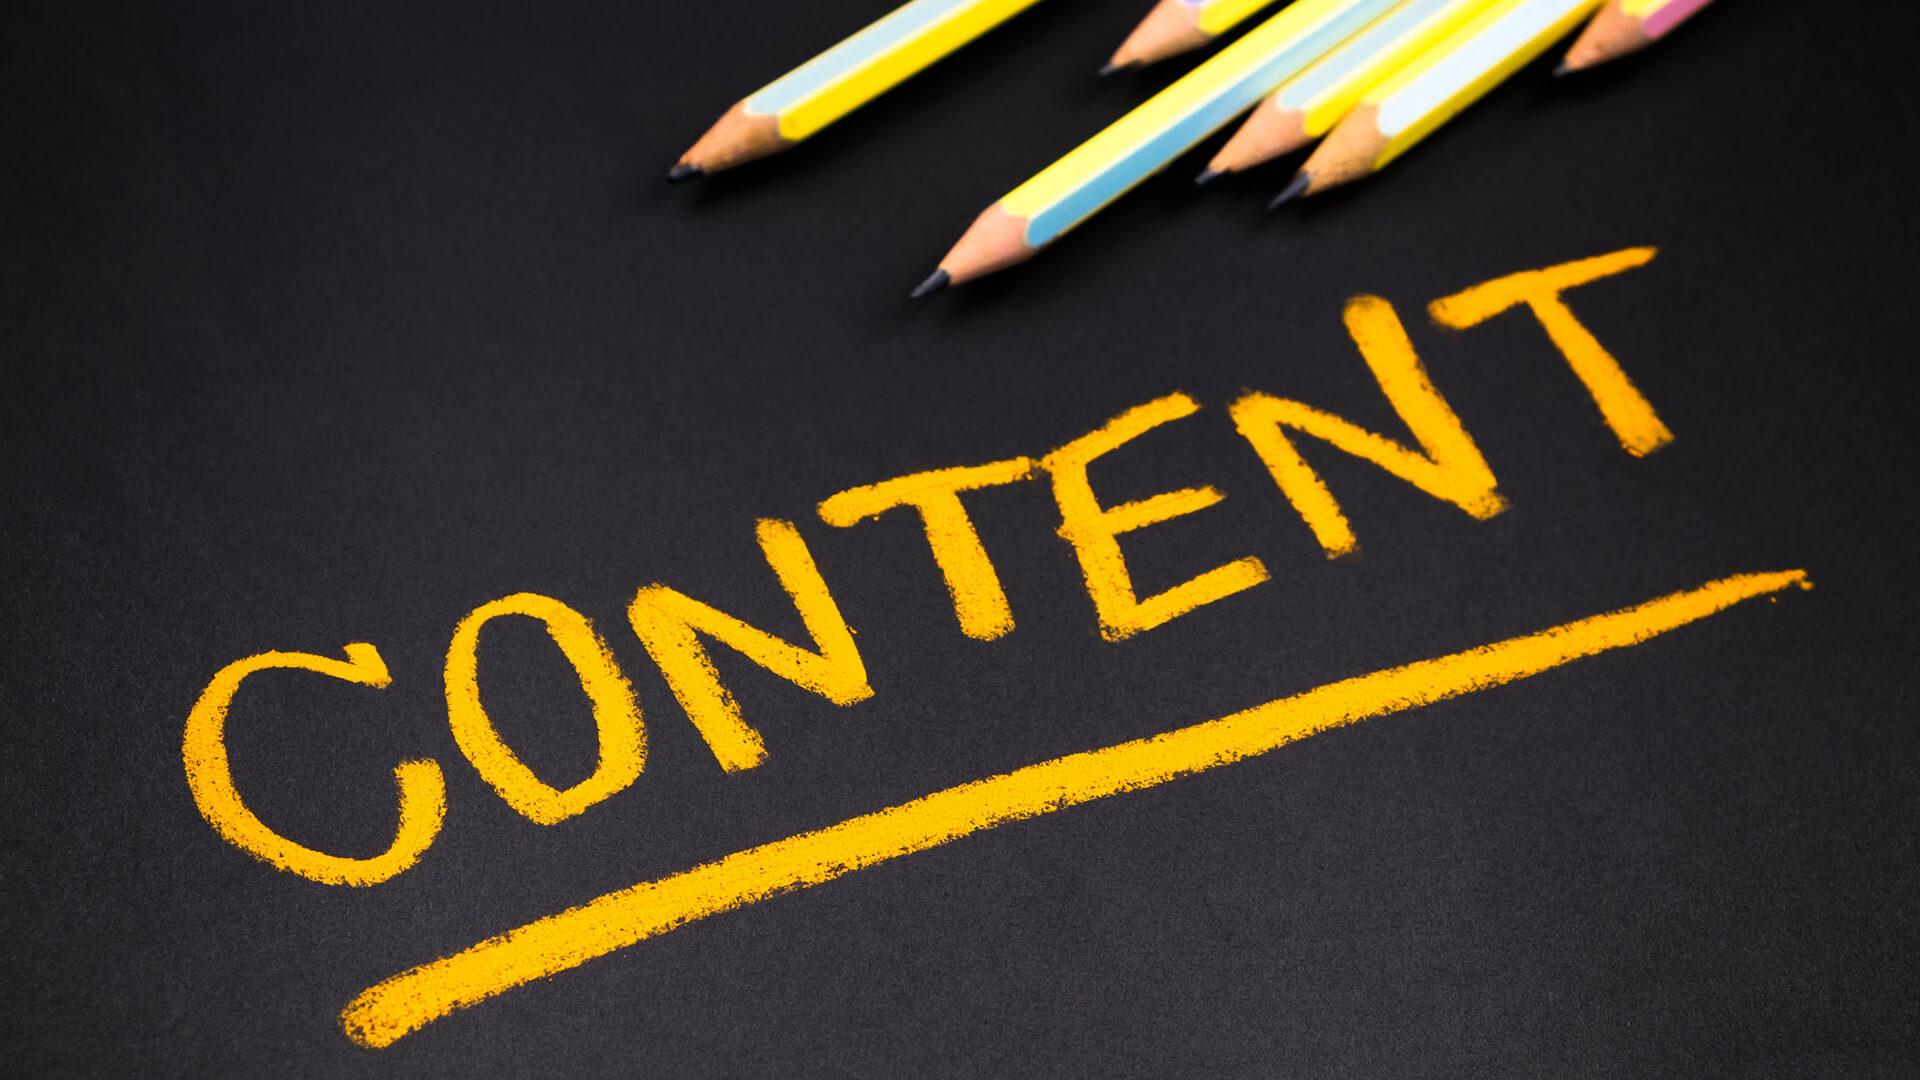 content-marketing-writing-pencils-ss-1920